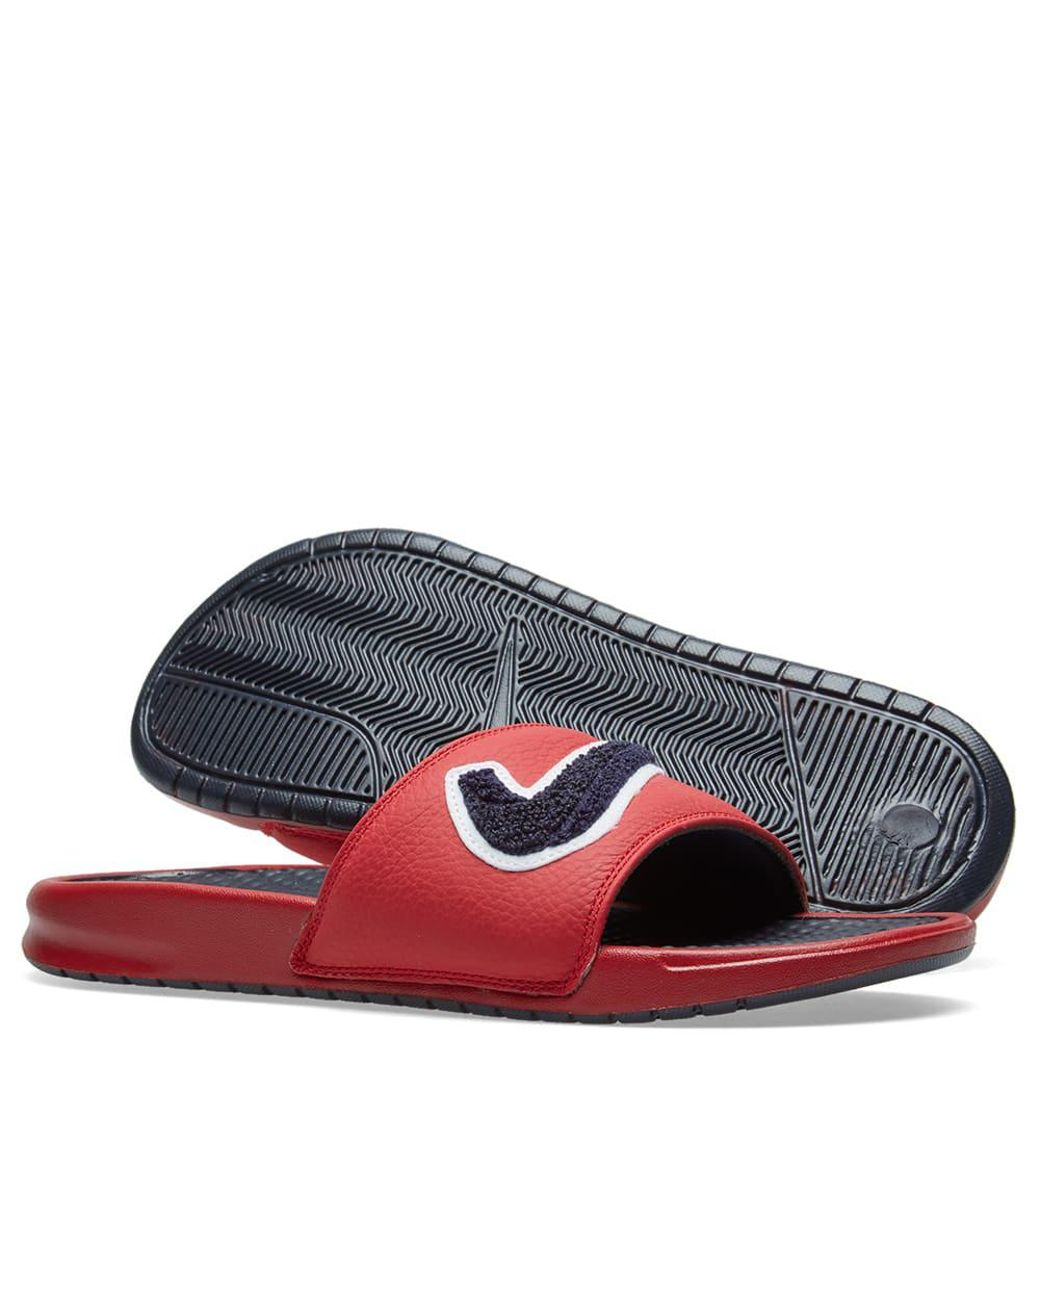 924b90dab Lyst - Nike Benassi Jdi Chenille in Red for Men